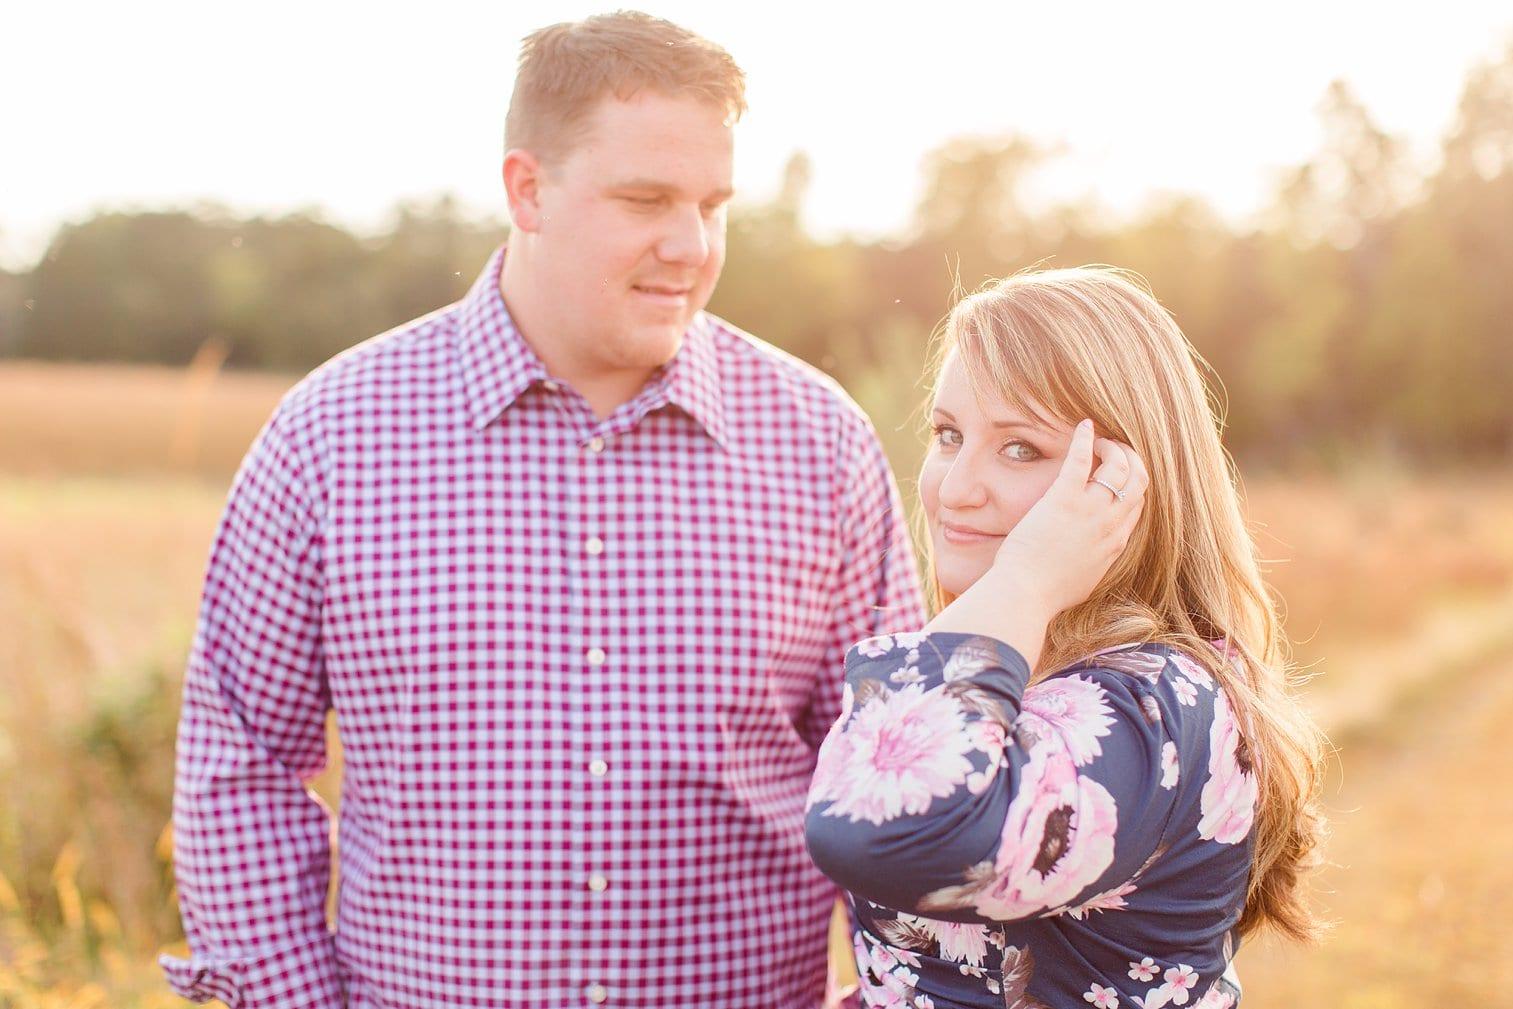 Henry Hill Manassas Battlefield Engagement Session Megan Kelsey Photography-47.jpg